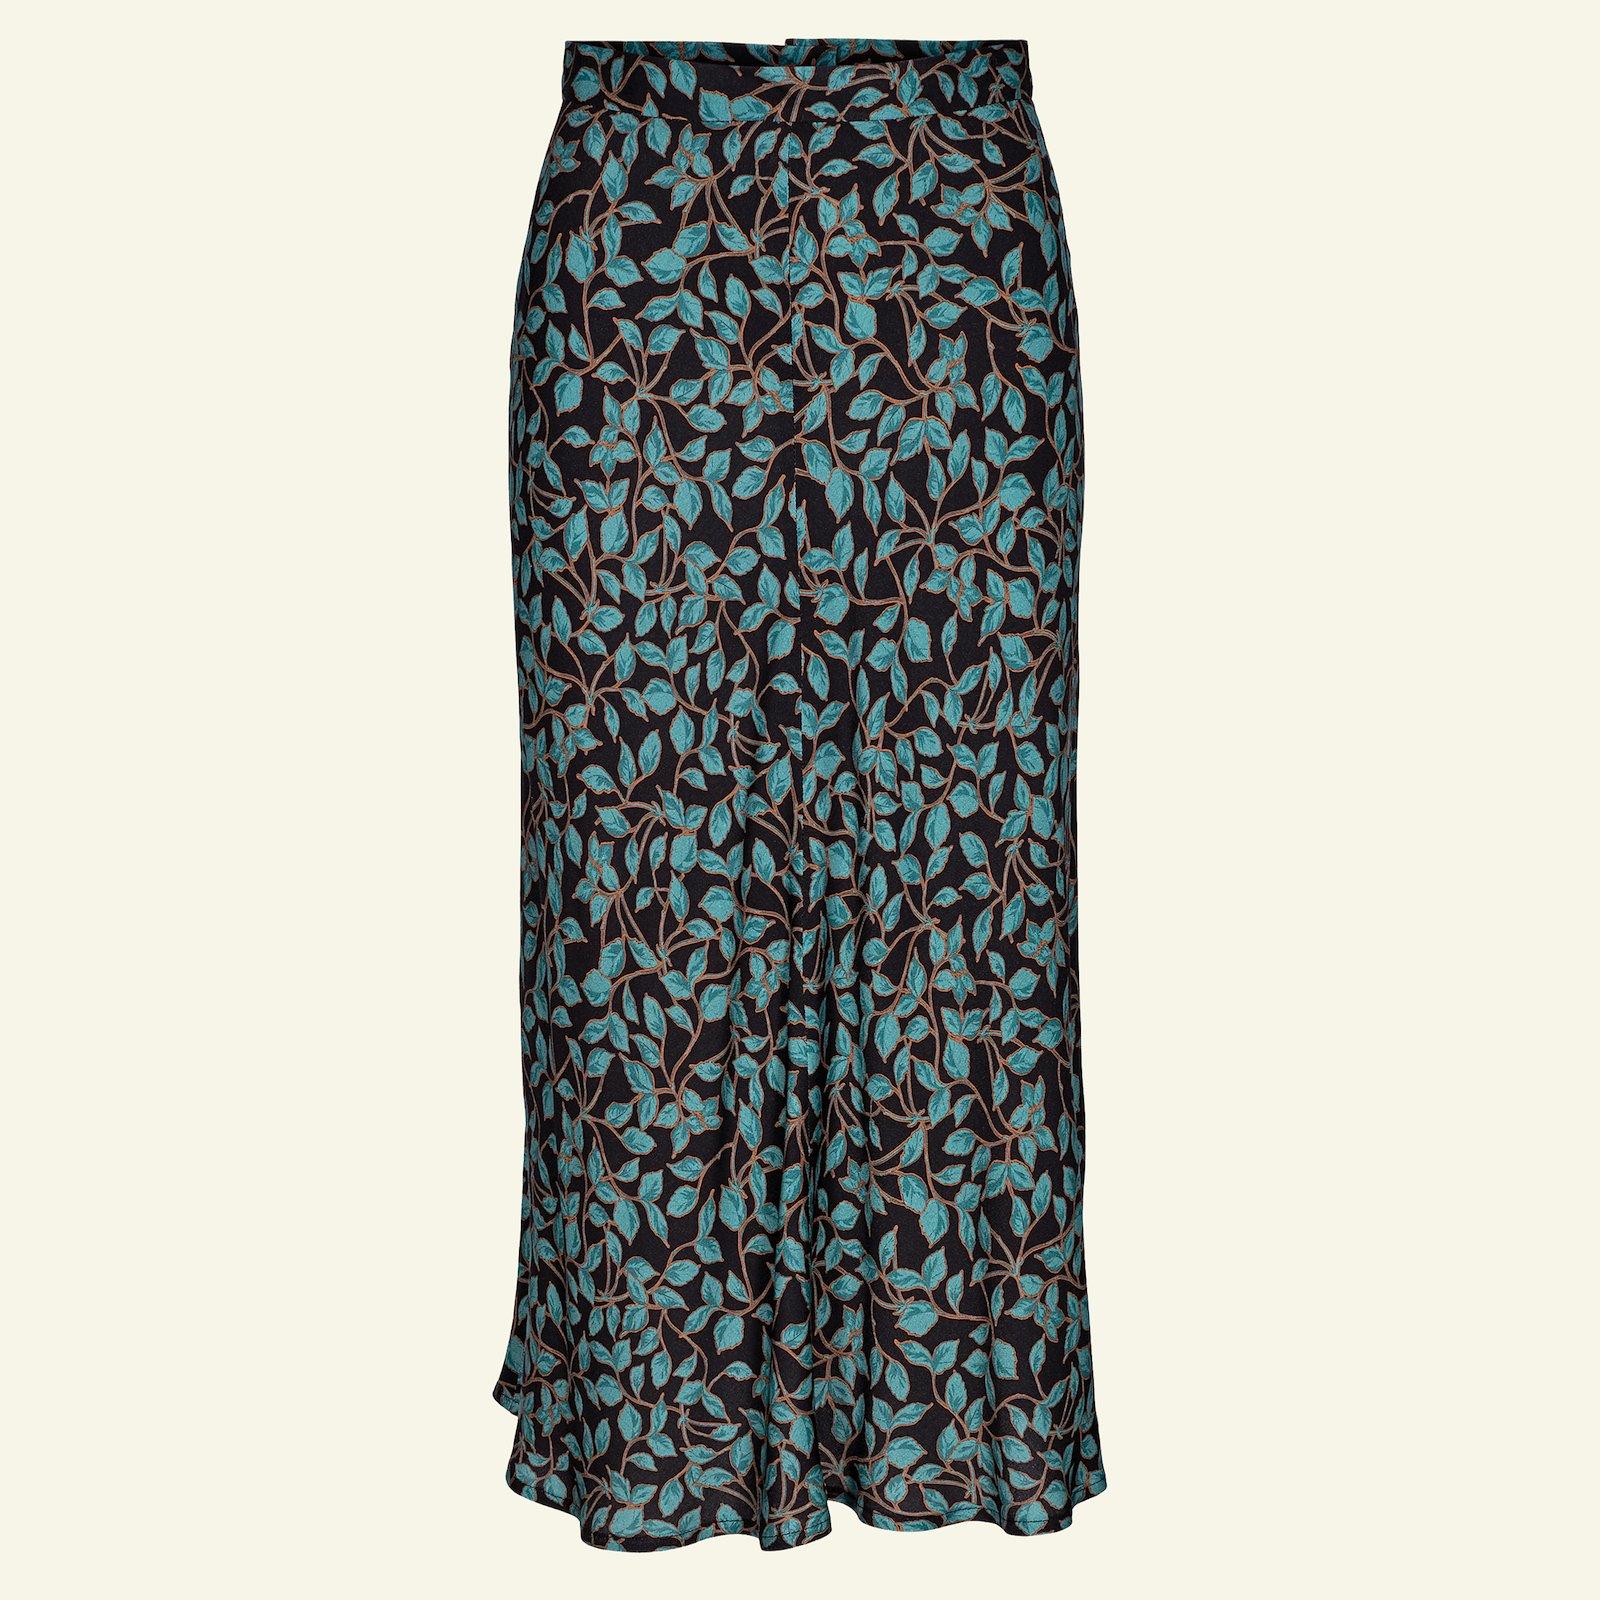 Skirt with A-shape, 44/16 p21038_730098_sskit